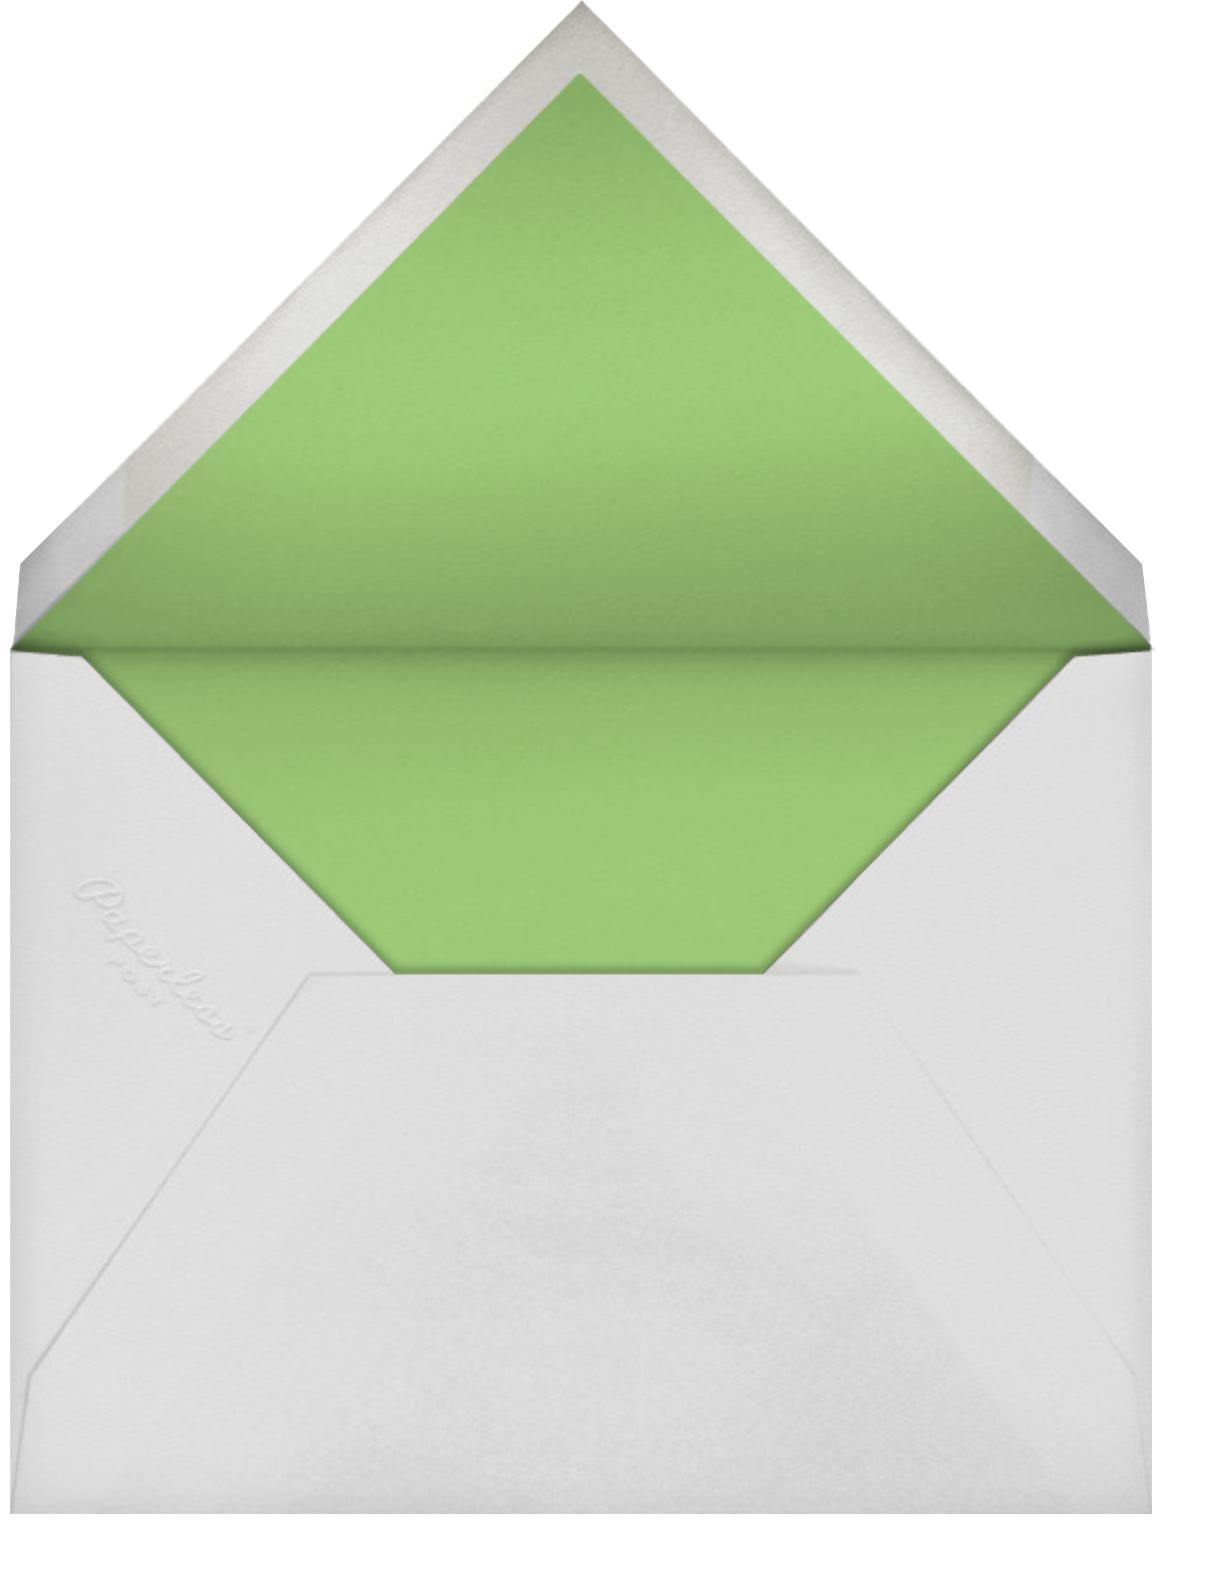 Palmier I - Spring Green - Paperless Post - All - envelope back